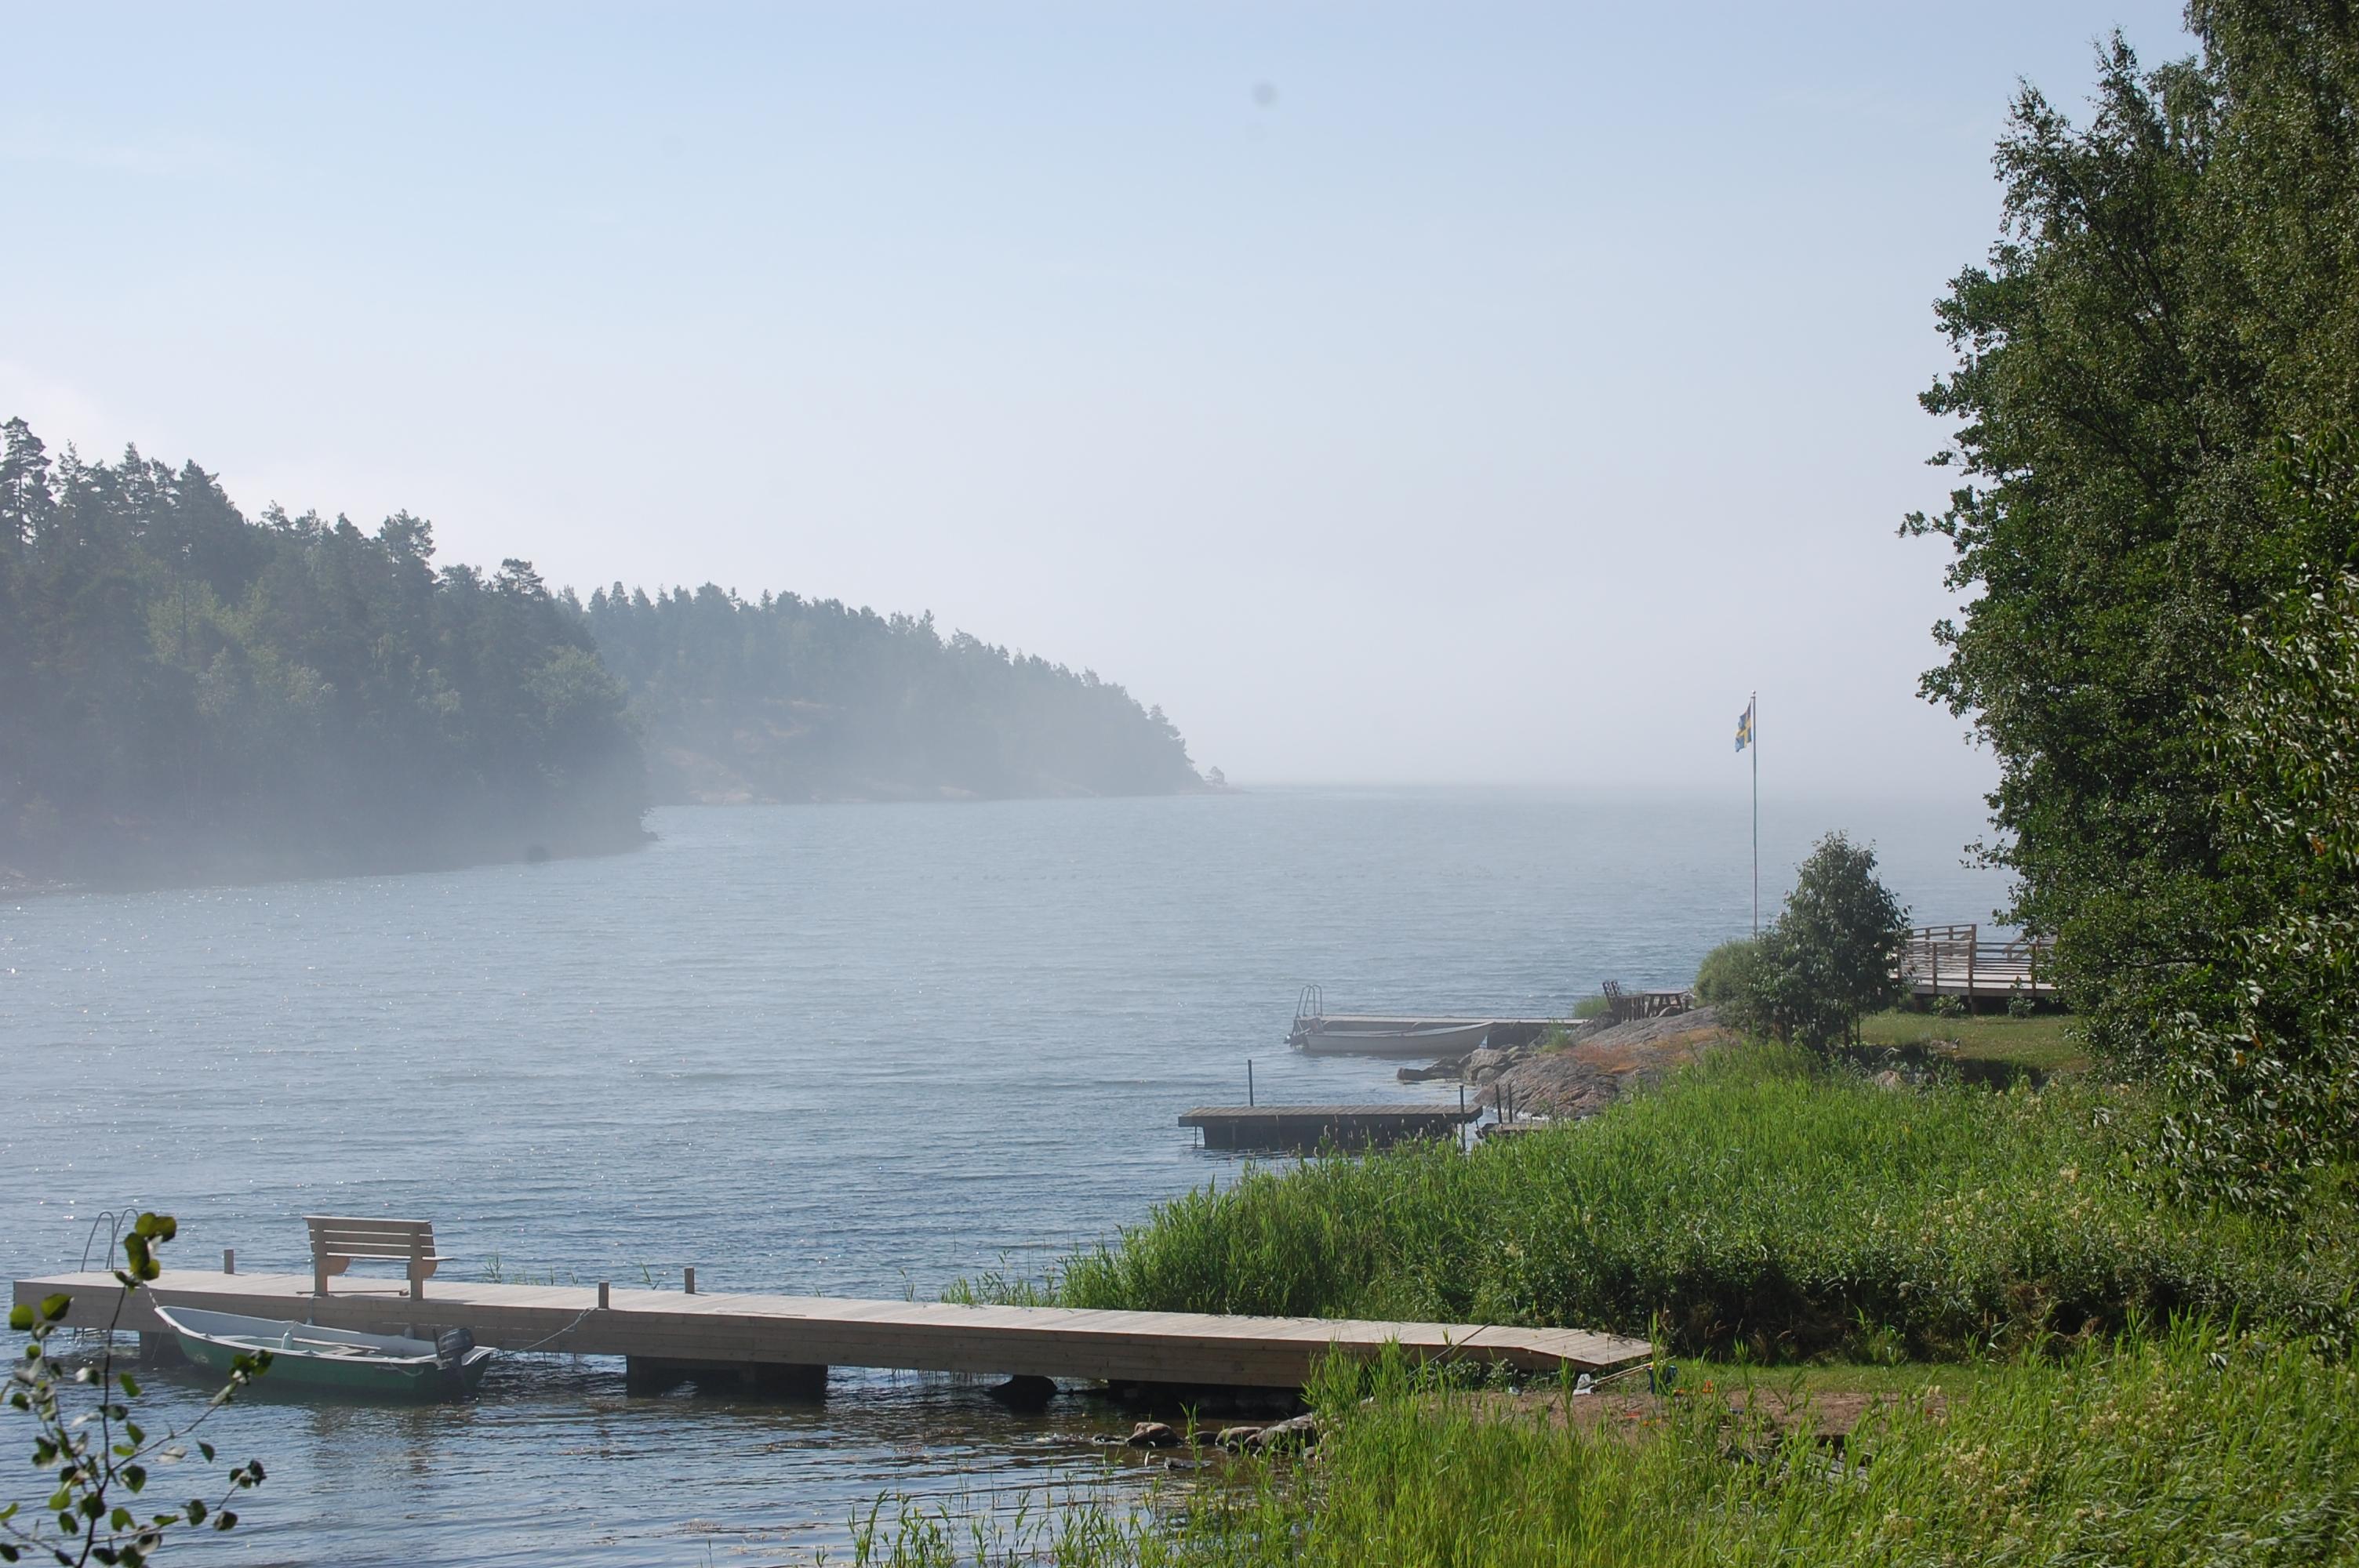 A foggy morning, Gryt archipelago, Valdemarsvik, Sweden.